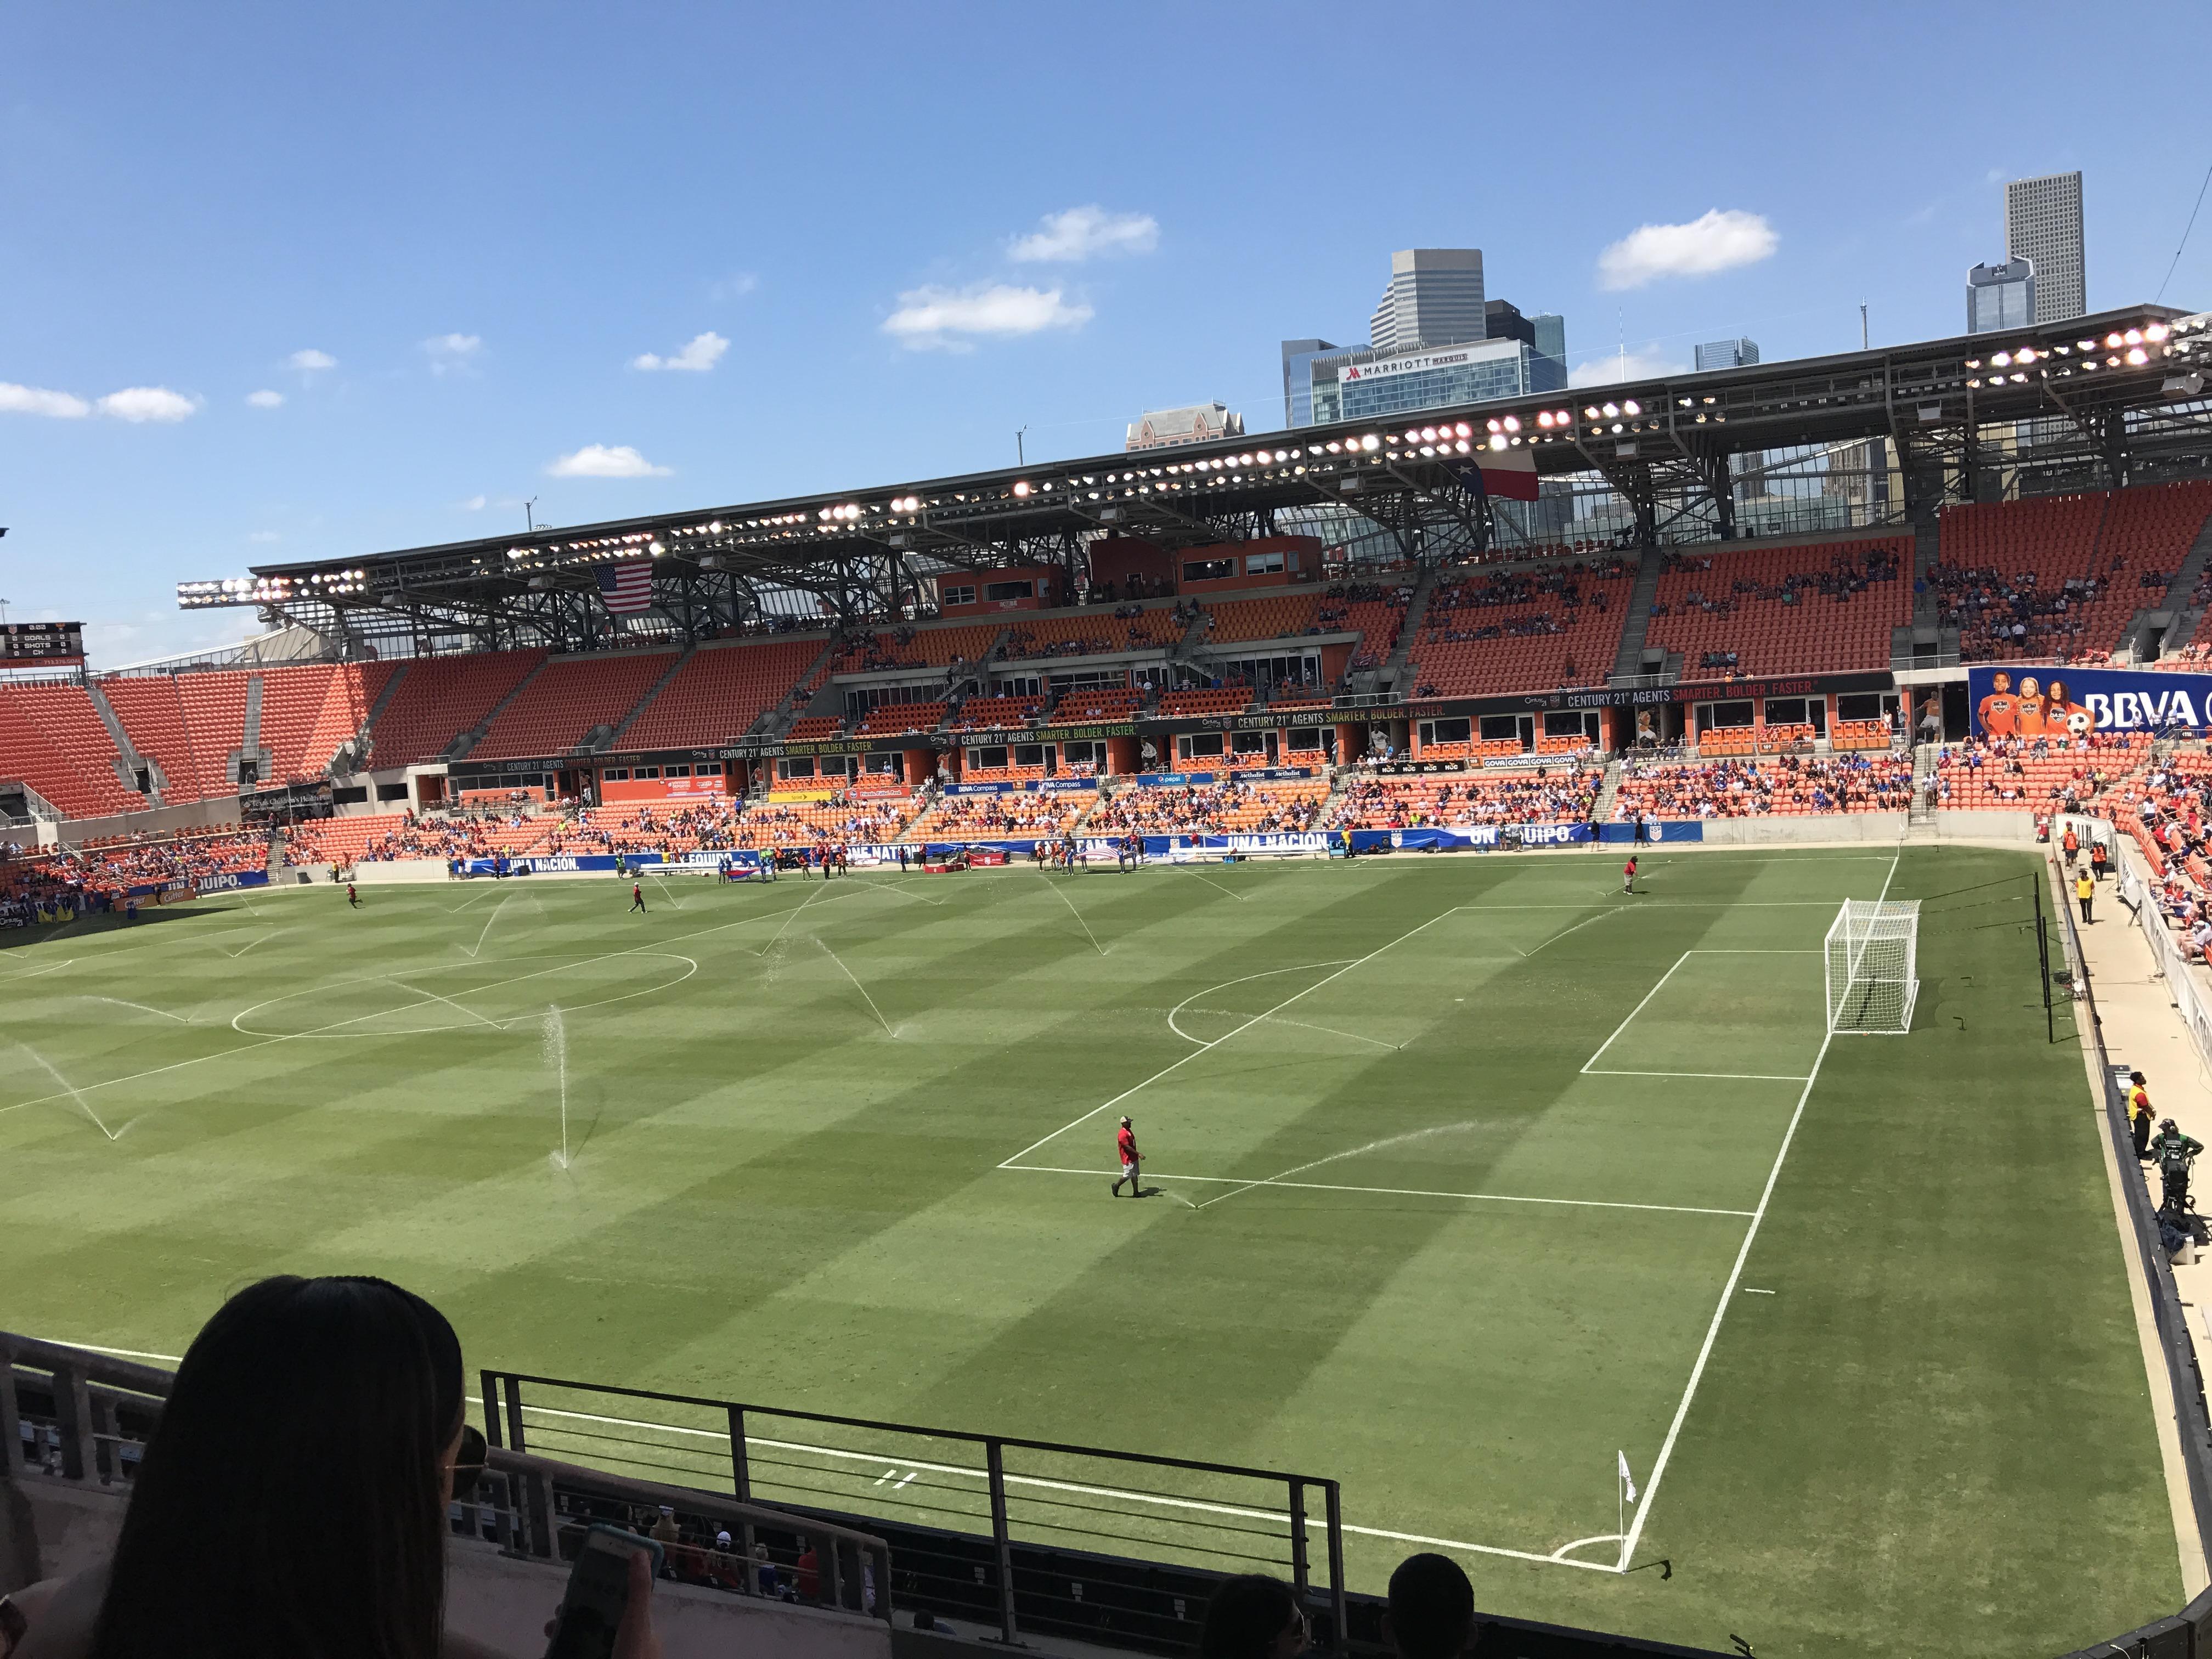 BBVA Stadium Section 103 Row F Seat 27